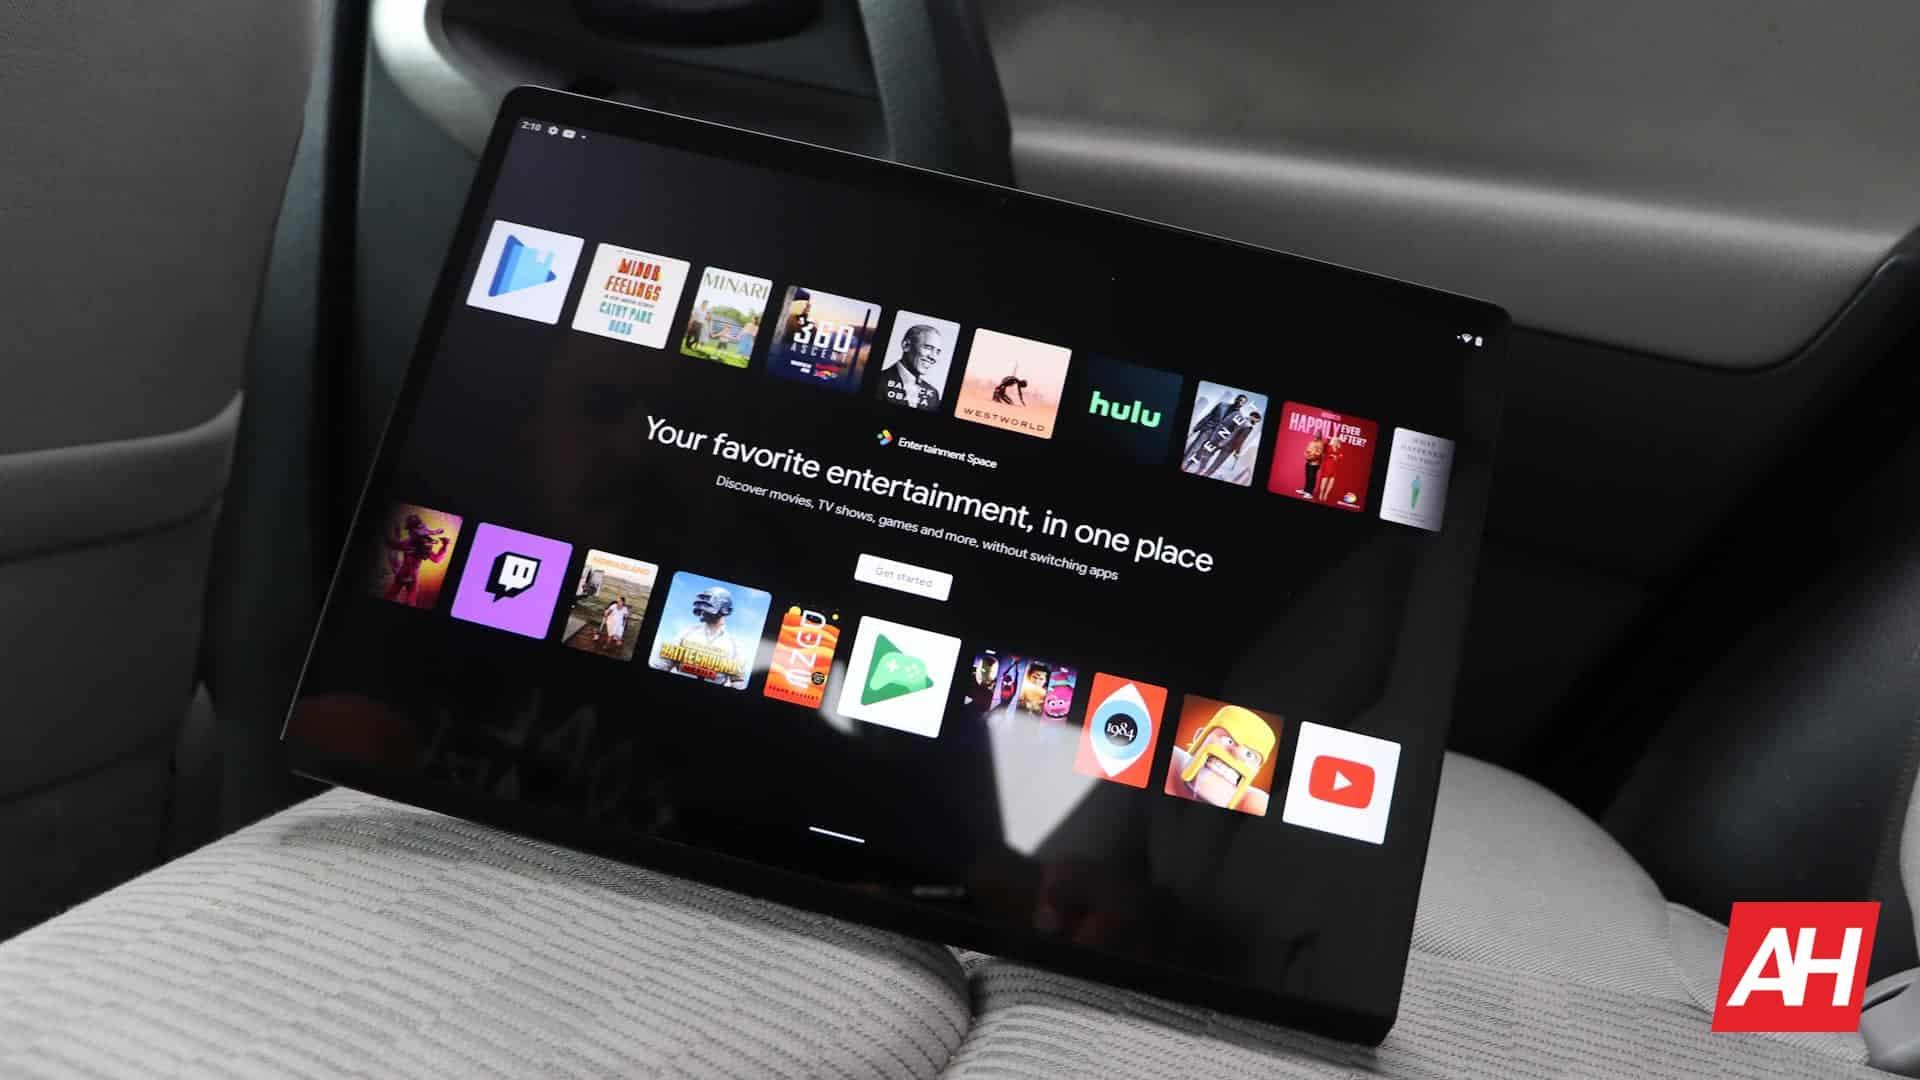 06 Lenovo Yoga Tab 13 review software DG AH 2021